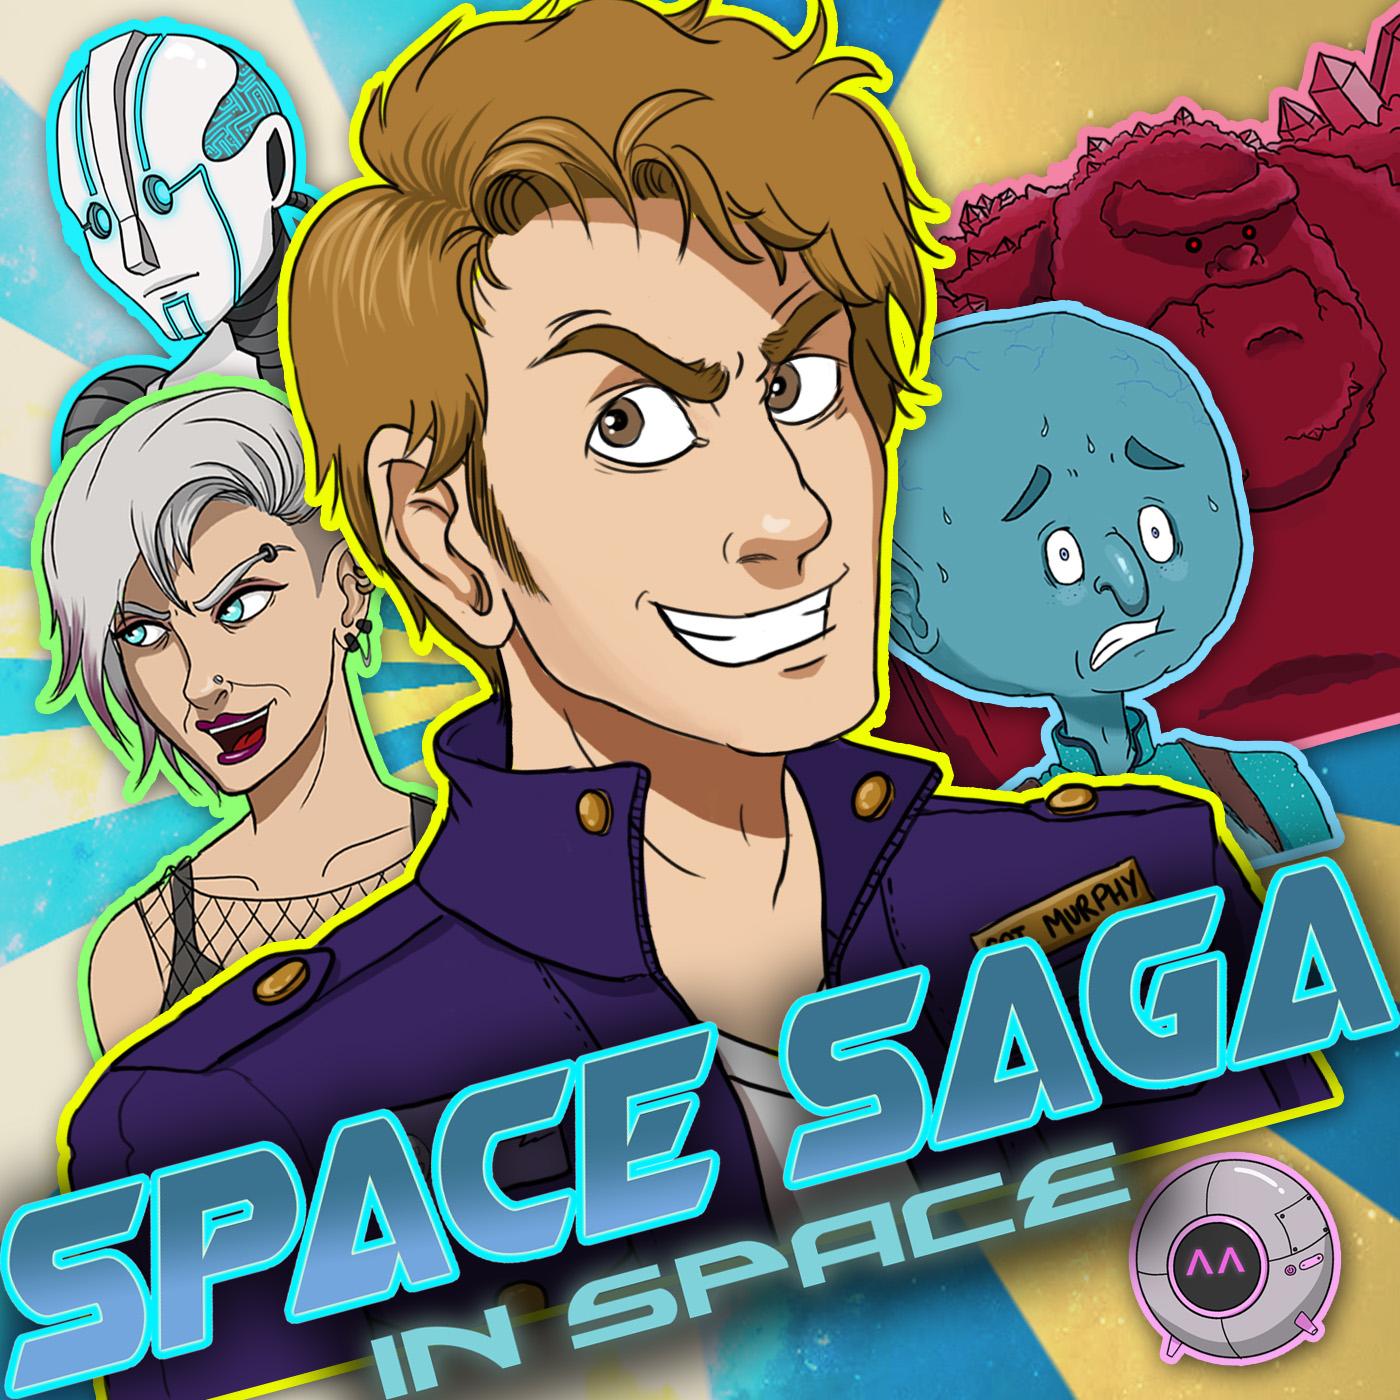 Space Saga Cover